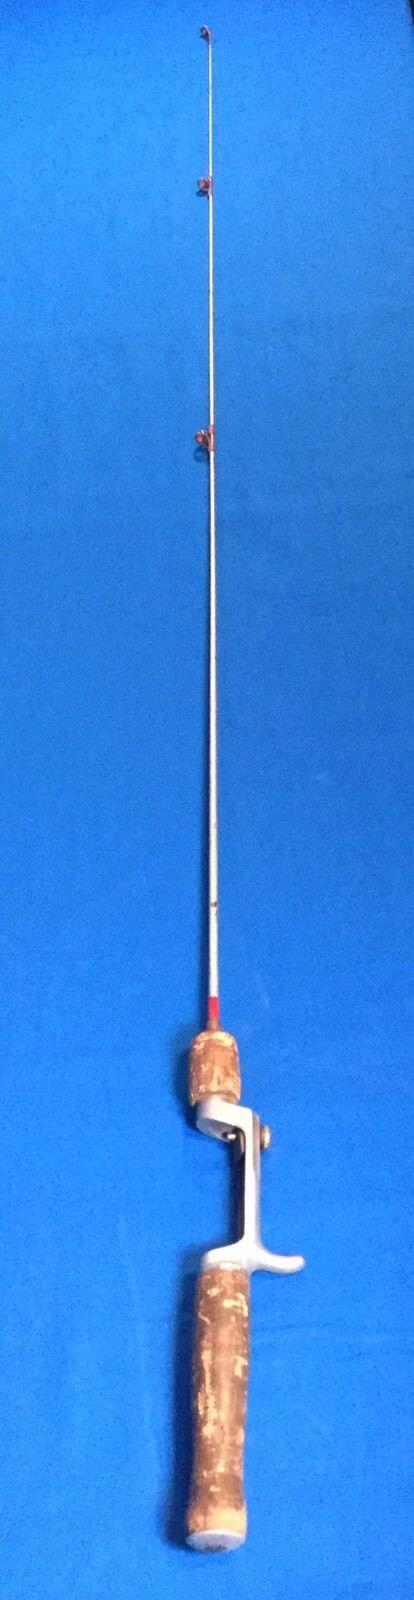 Vtg American Fork & Hoe Square Steel Bait Casting Rod Cork Handle Geneva OH